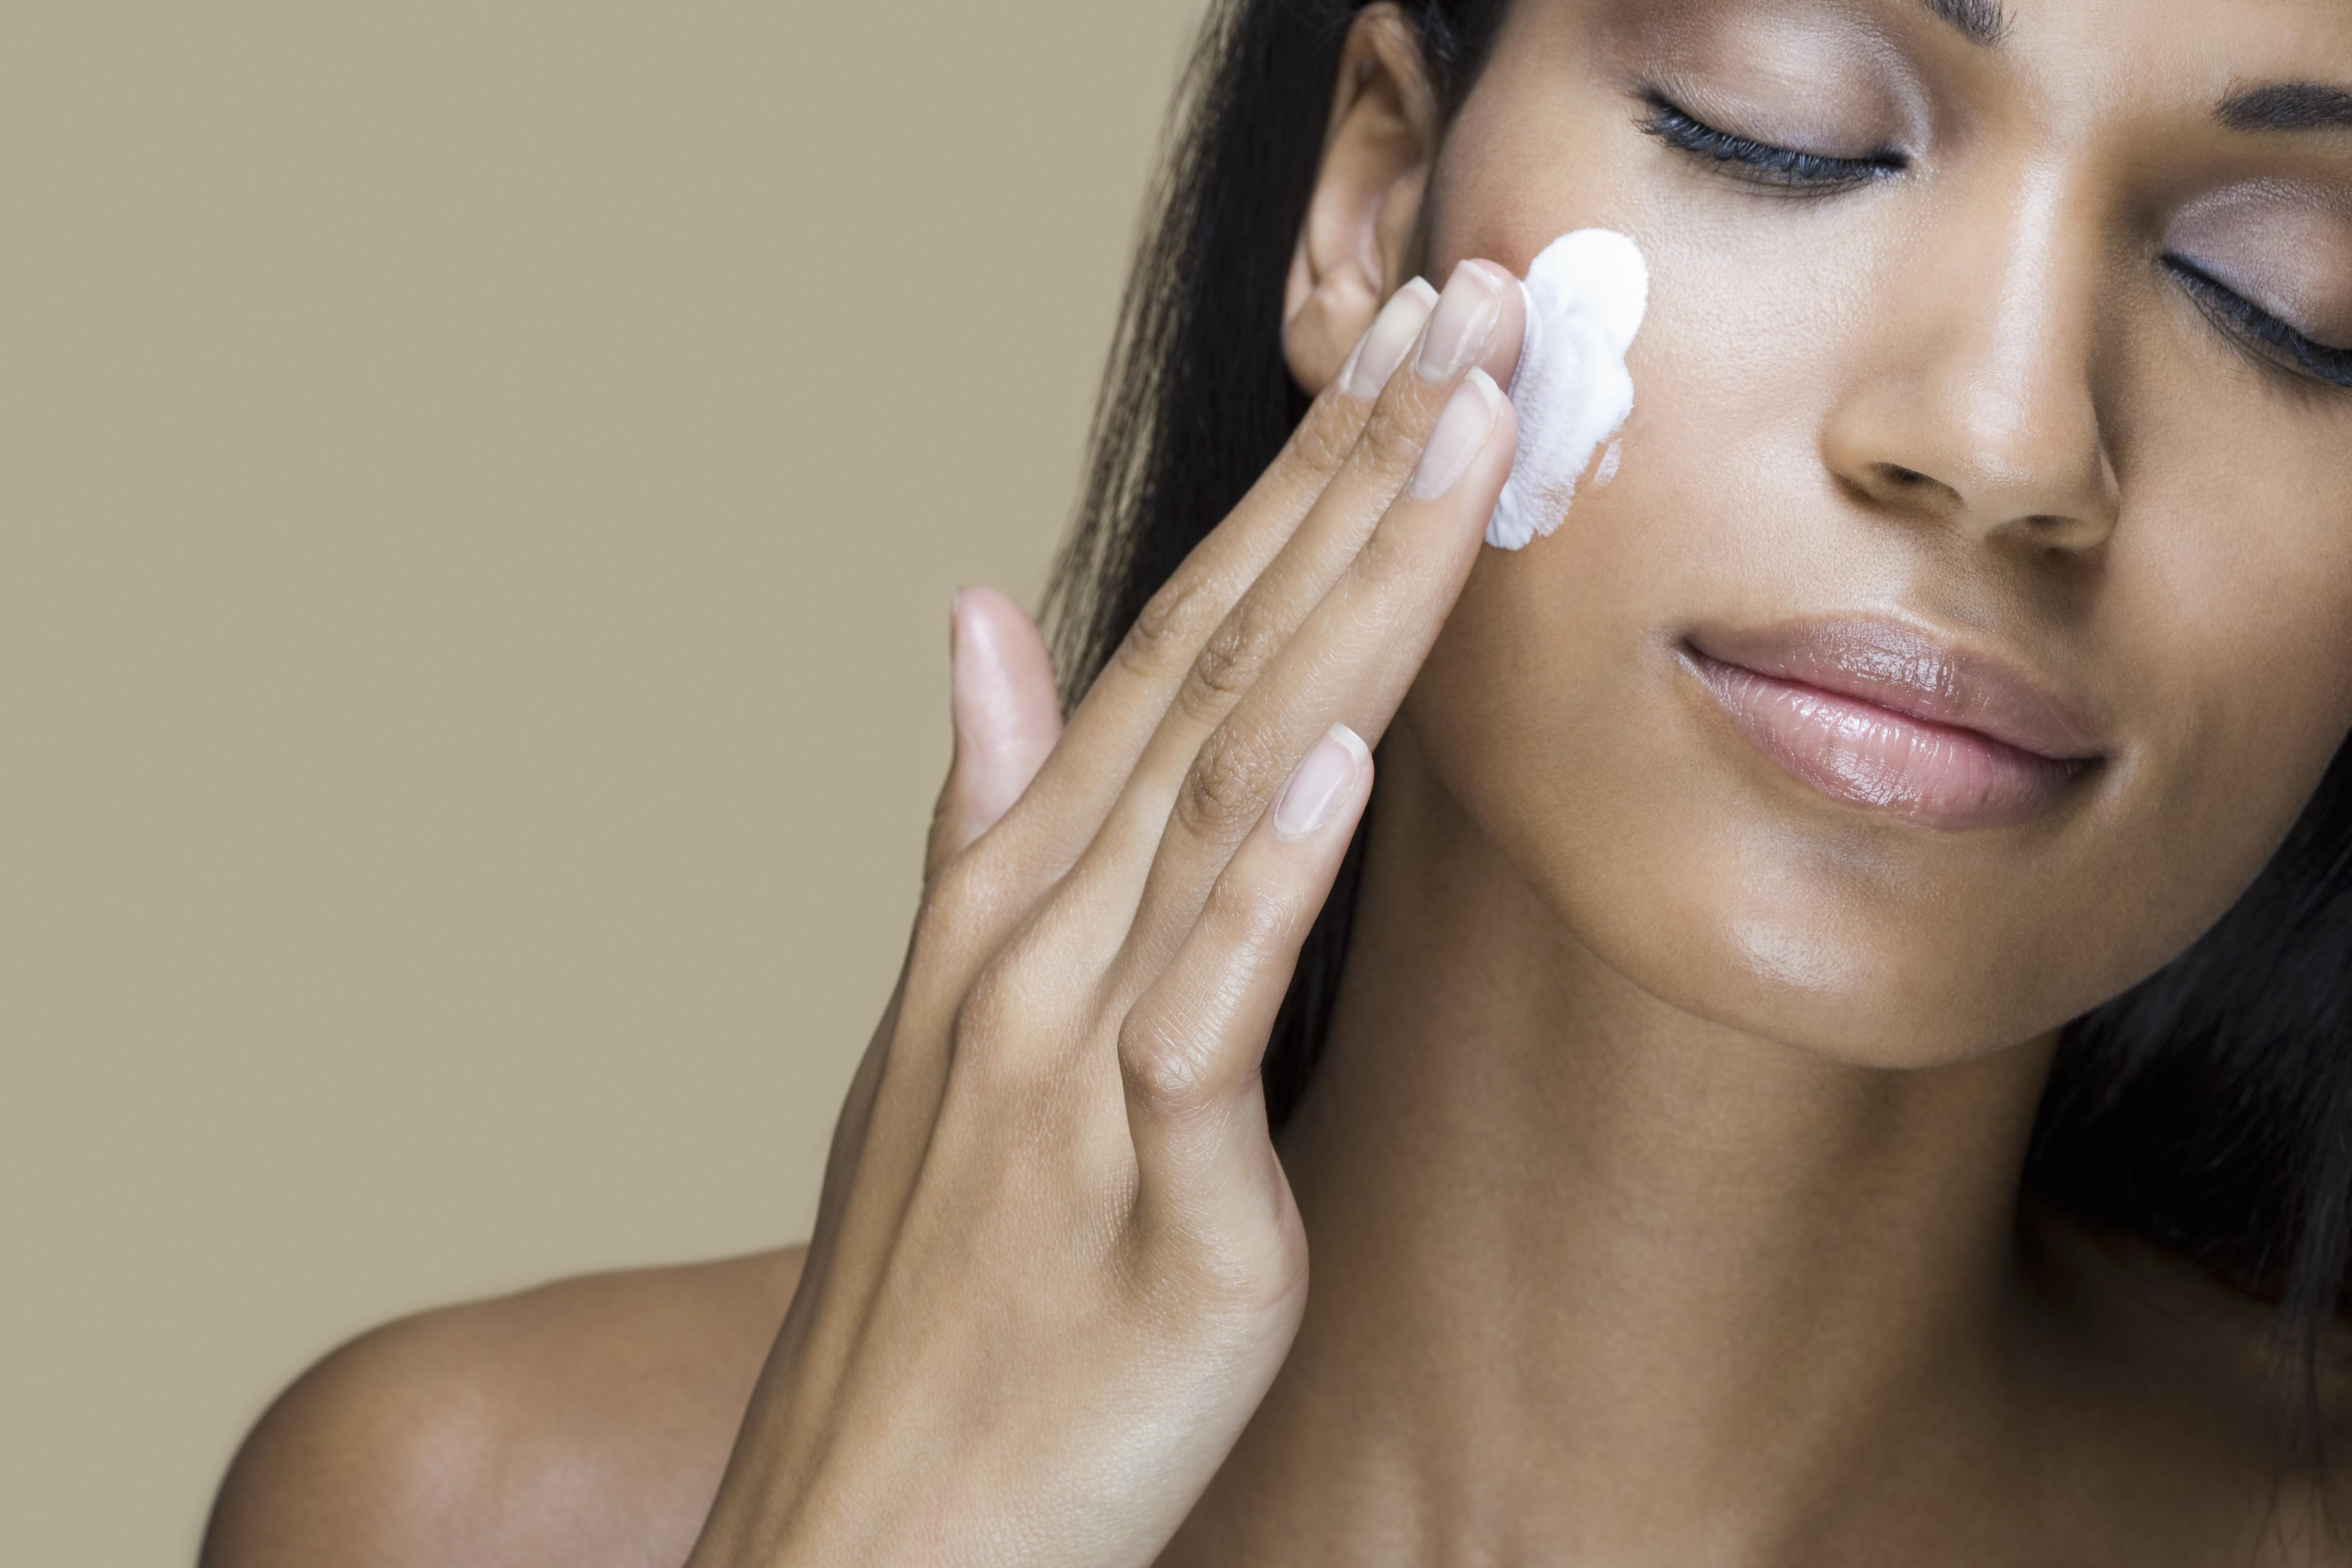 A woman rubbing moisturizer into her skin